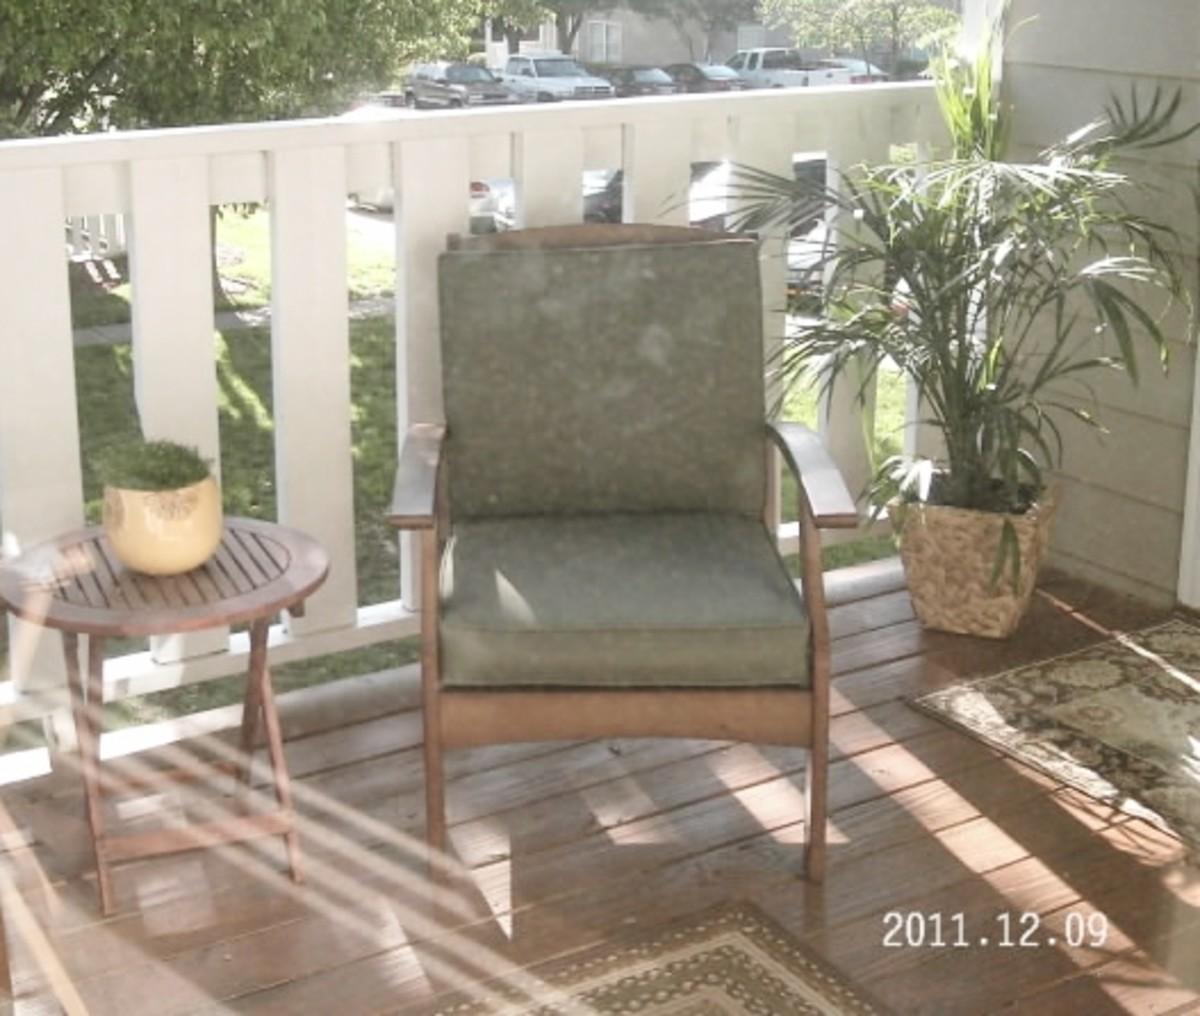 city-patio-design-beautify-your-apartment-or-condo-patio-for-summer